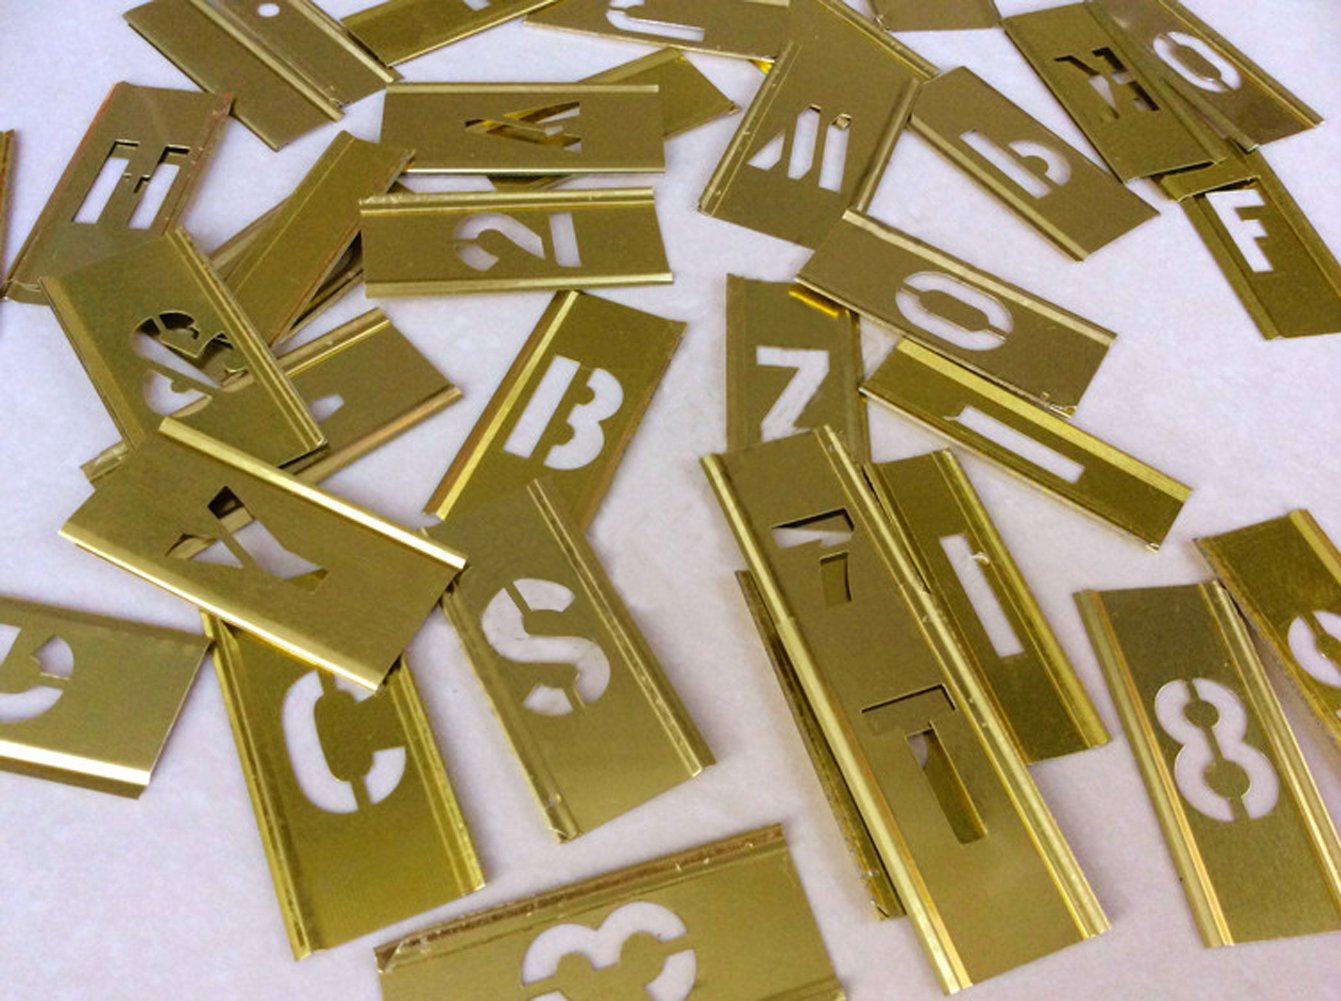 Deezio 4 Inch Brass Interlocking Stencil Set of Numbers and Letters Kit - 46 Piece Set by Deezio (Image #2)